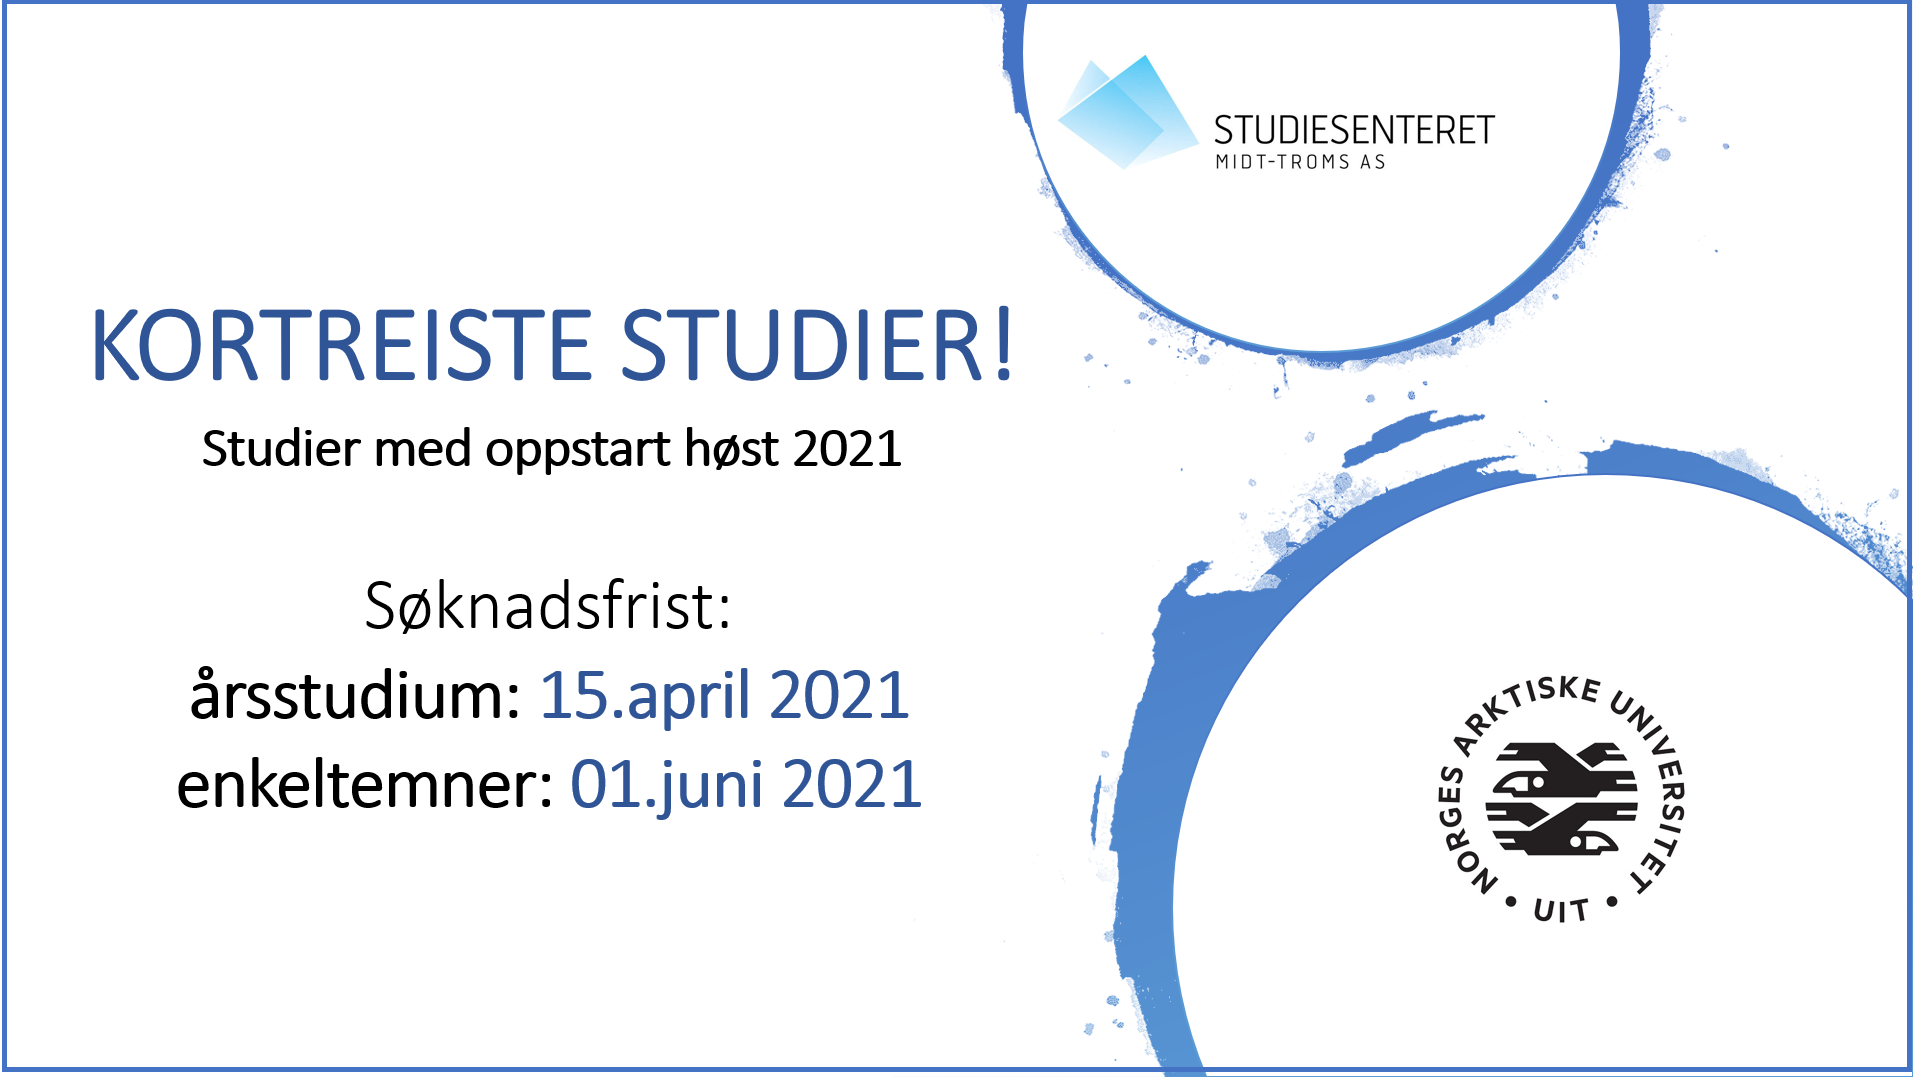 kortreiste studier 2021 annonse